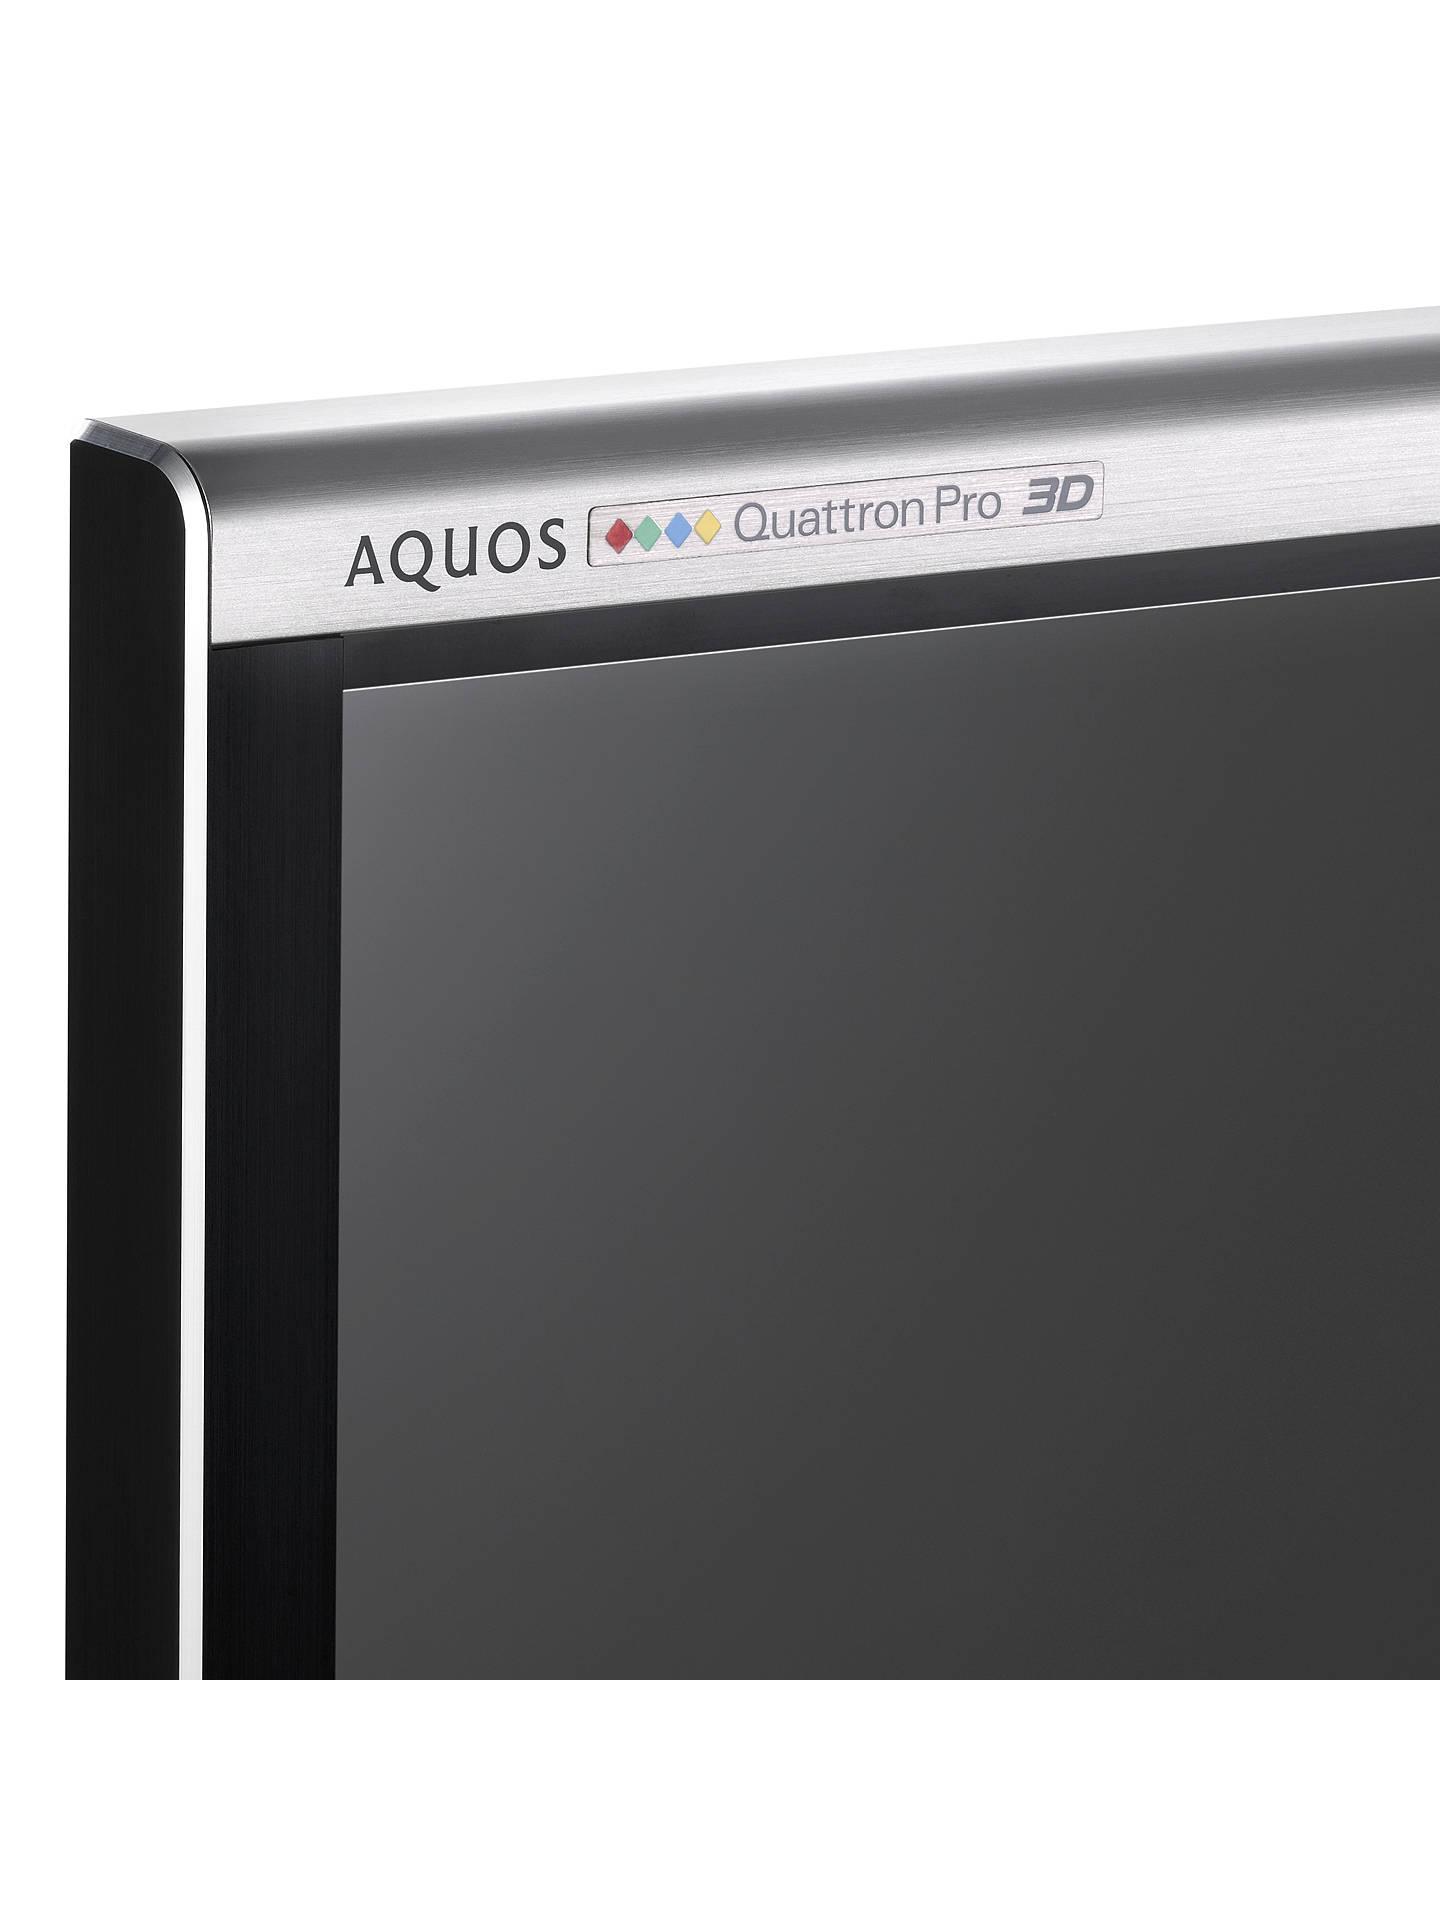 Sharp Aquos LC60UQ10 LED 1080p Full HD 3D 4K Compatible